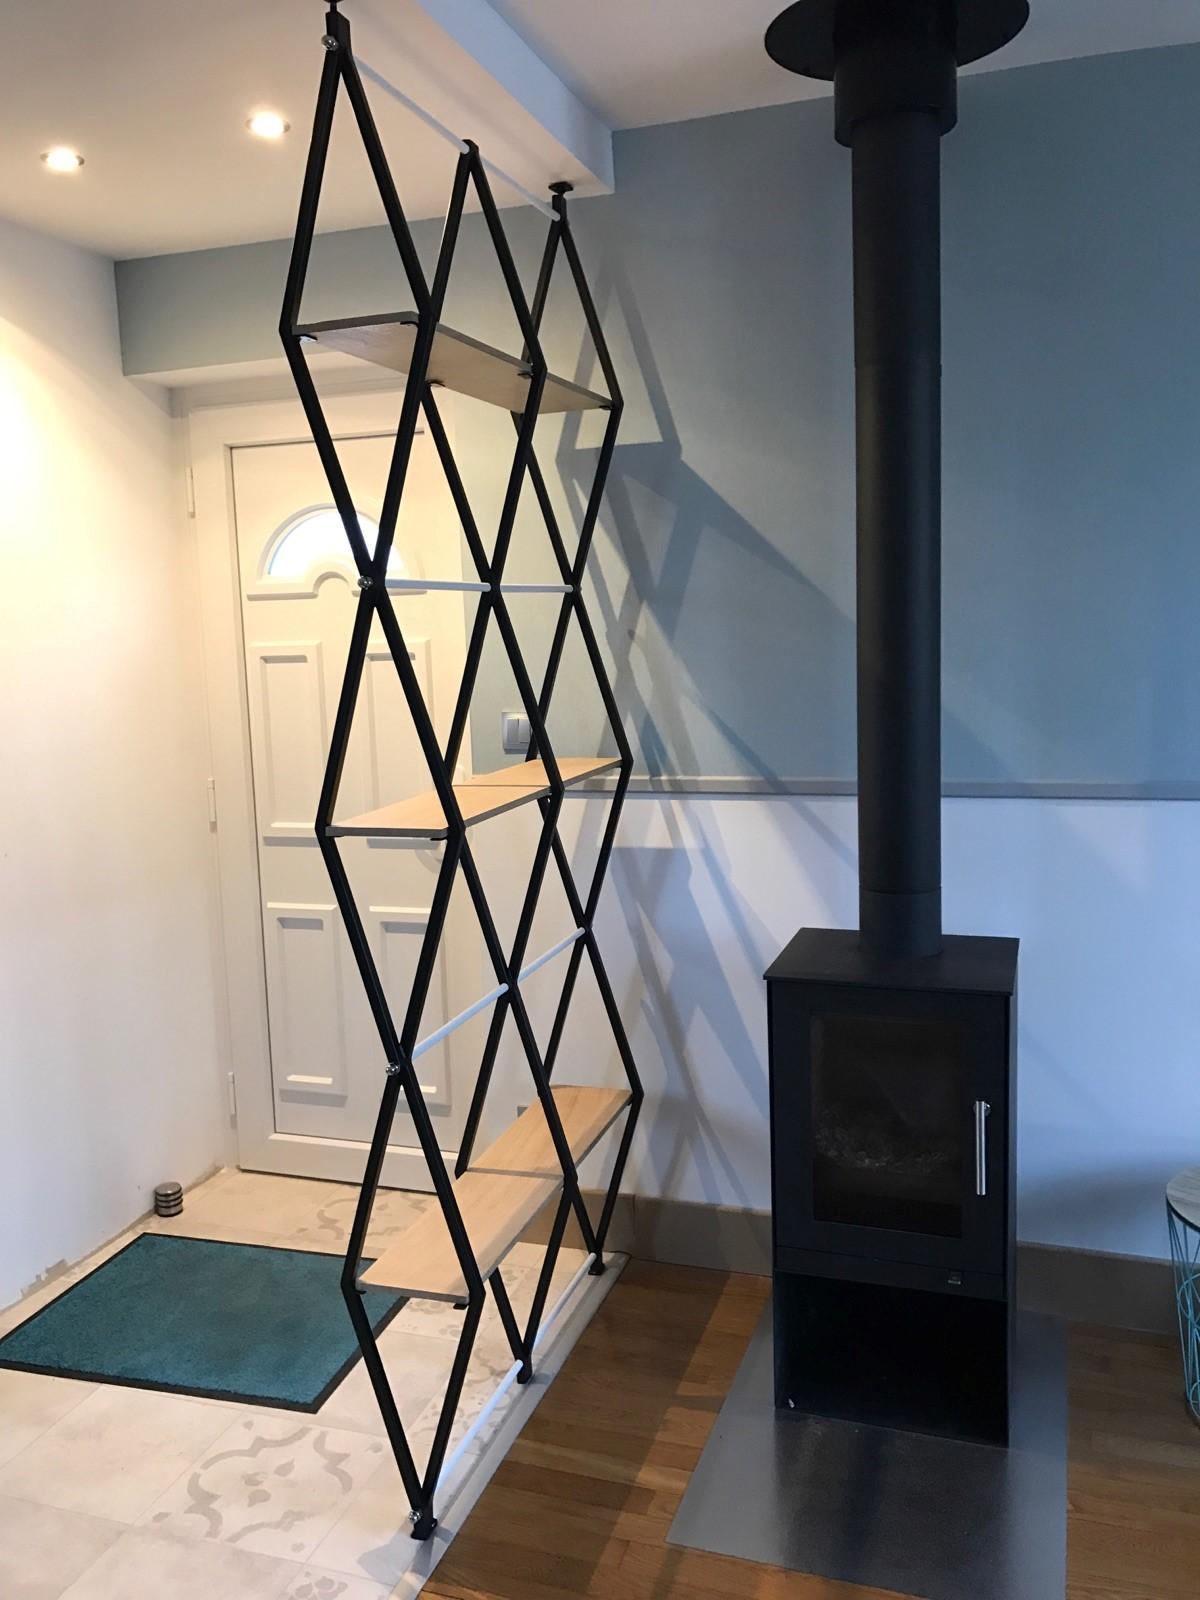 Mobilier d co style industriel m tallerie pavelot dijon for Deco mobilier design